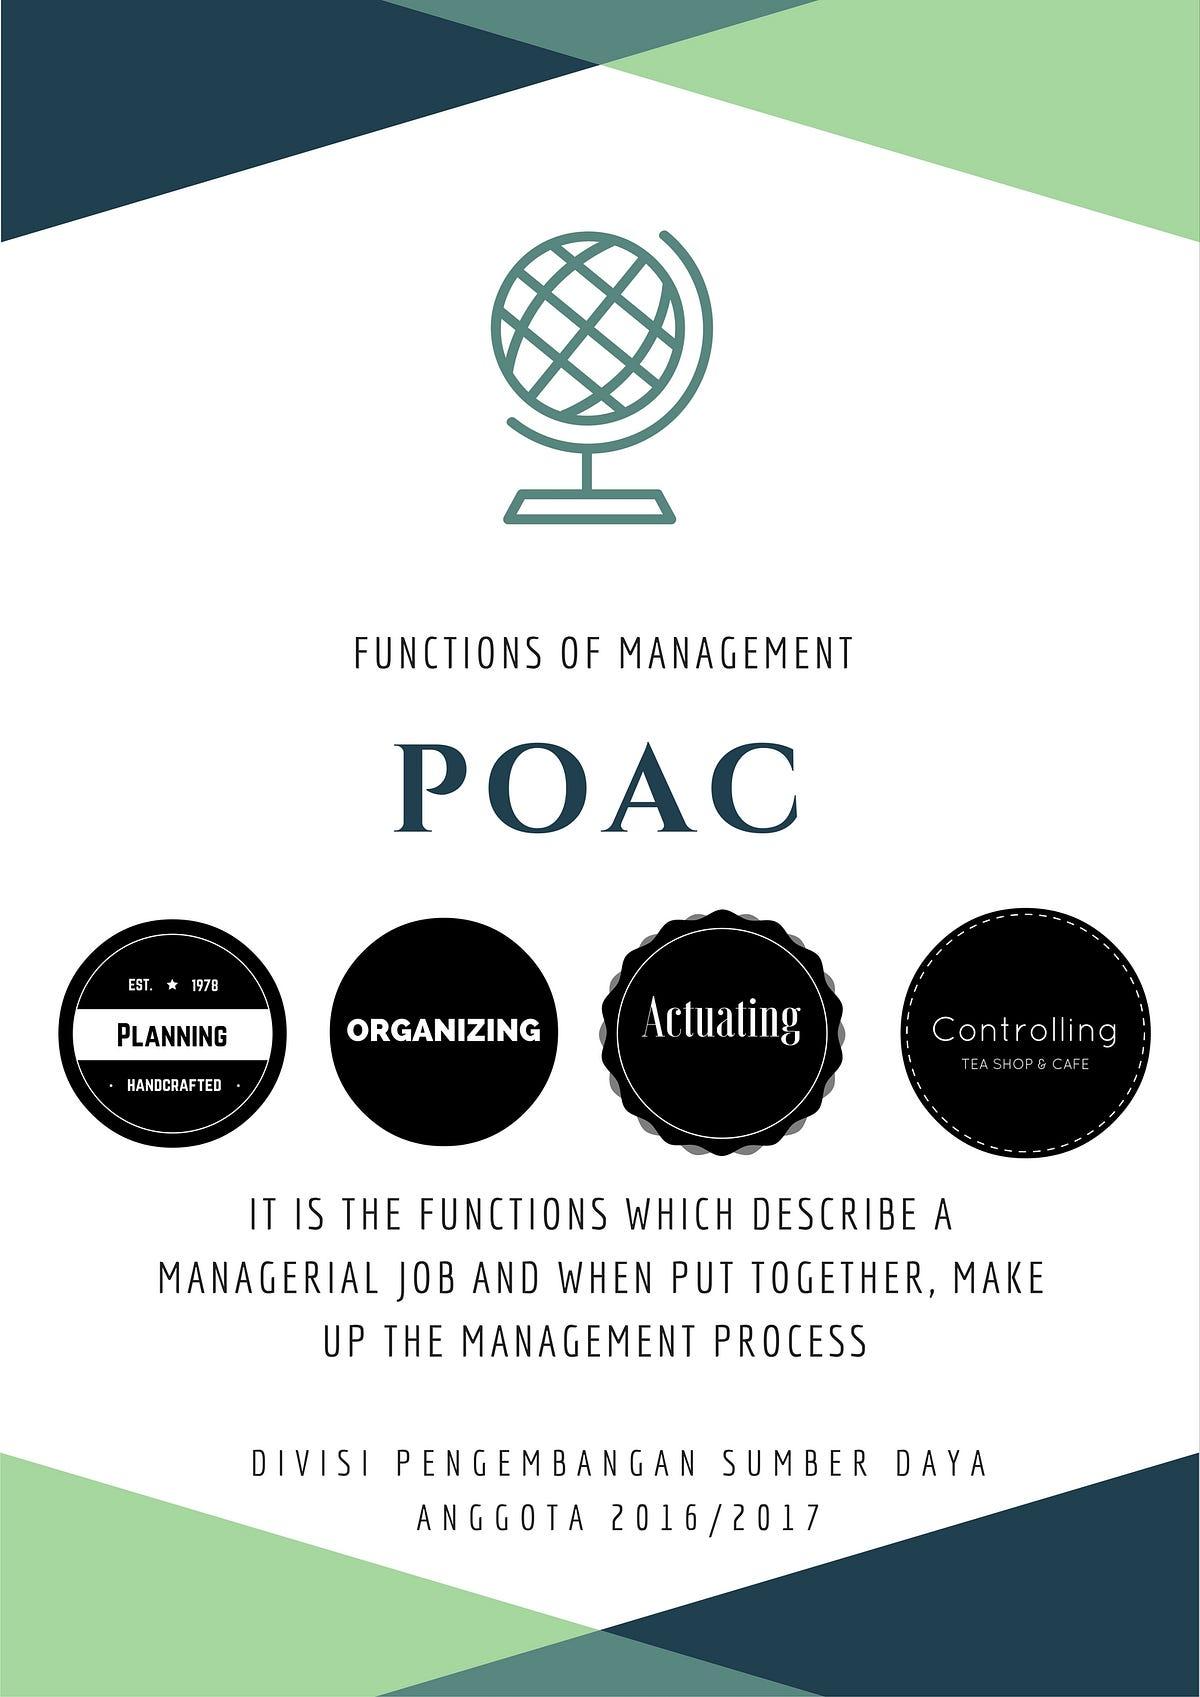 Makalah Poac : makalah, Planning,, Organizing,, Actuating,, Controlling, Manajemen, Organisasi, TERRA, Medium